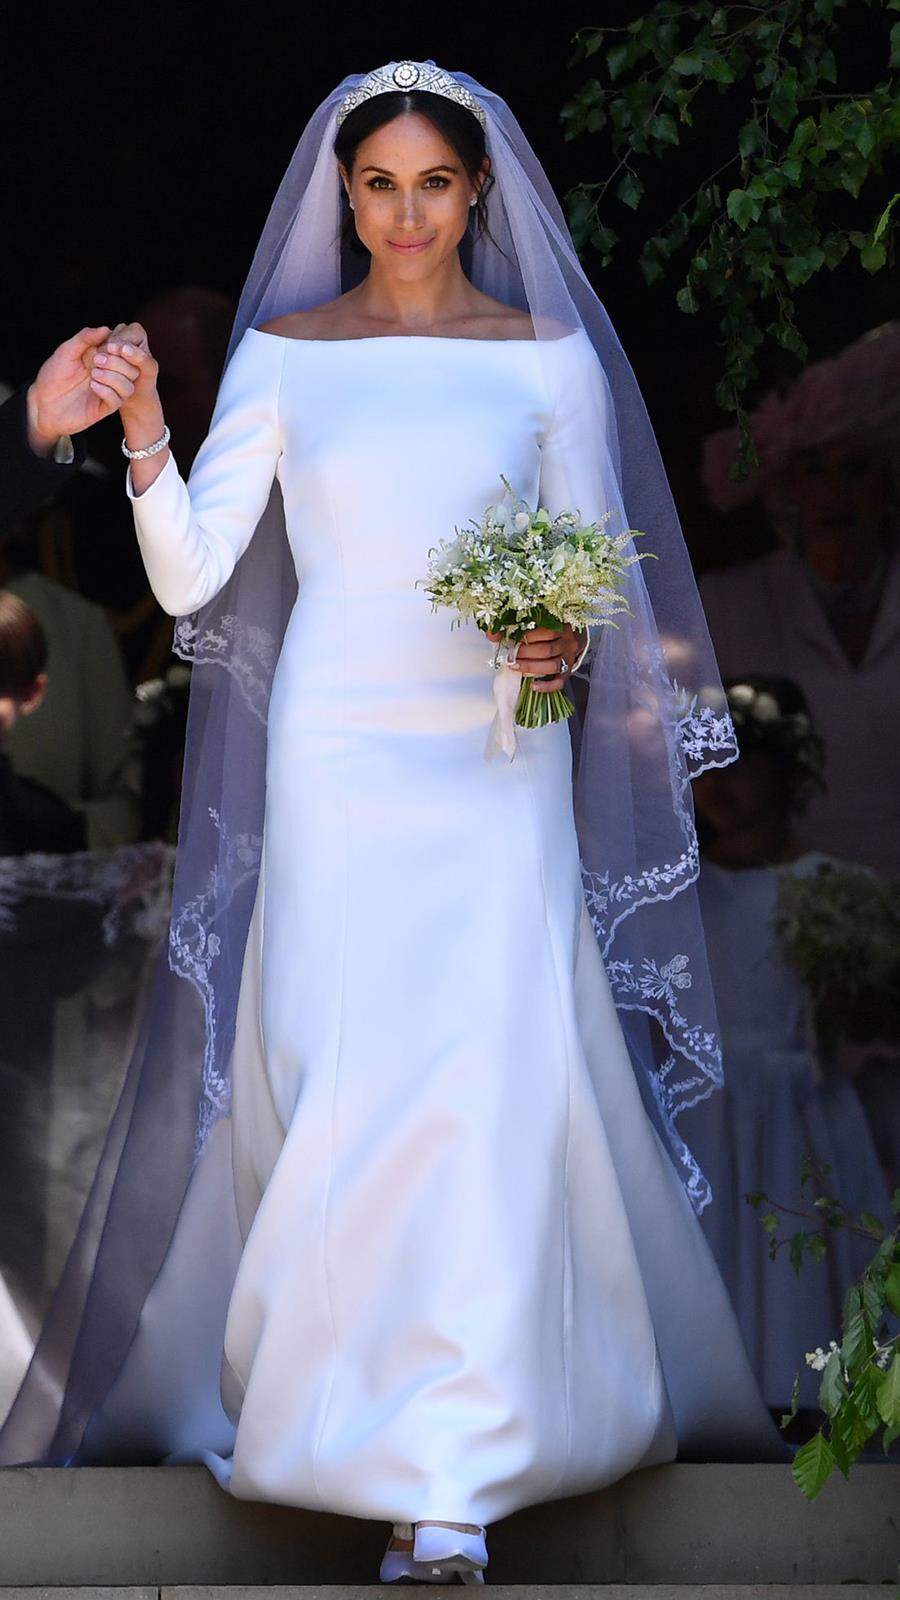 ae5b40188 410 Fotos de vestidos de novia - Pagina 3